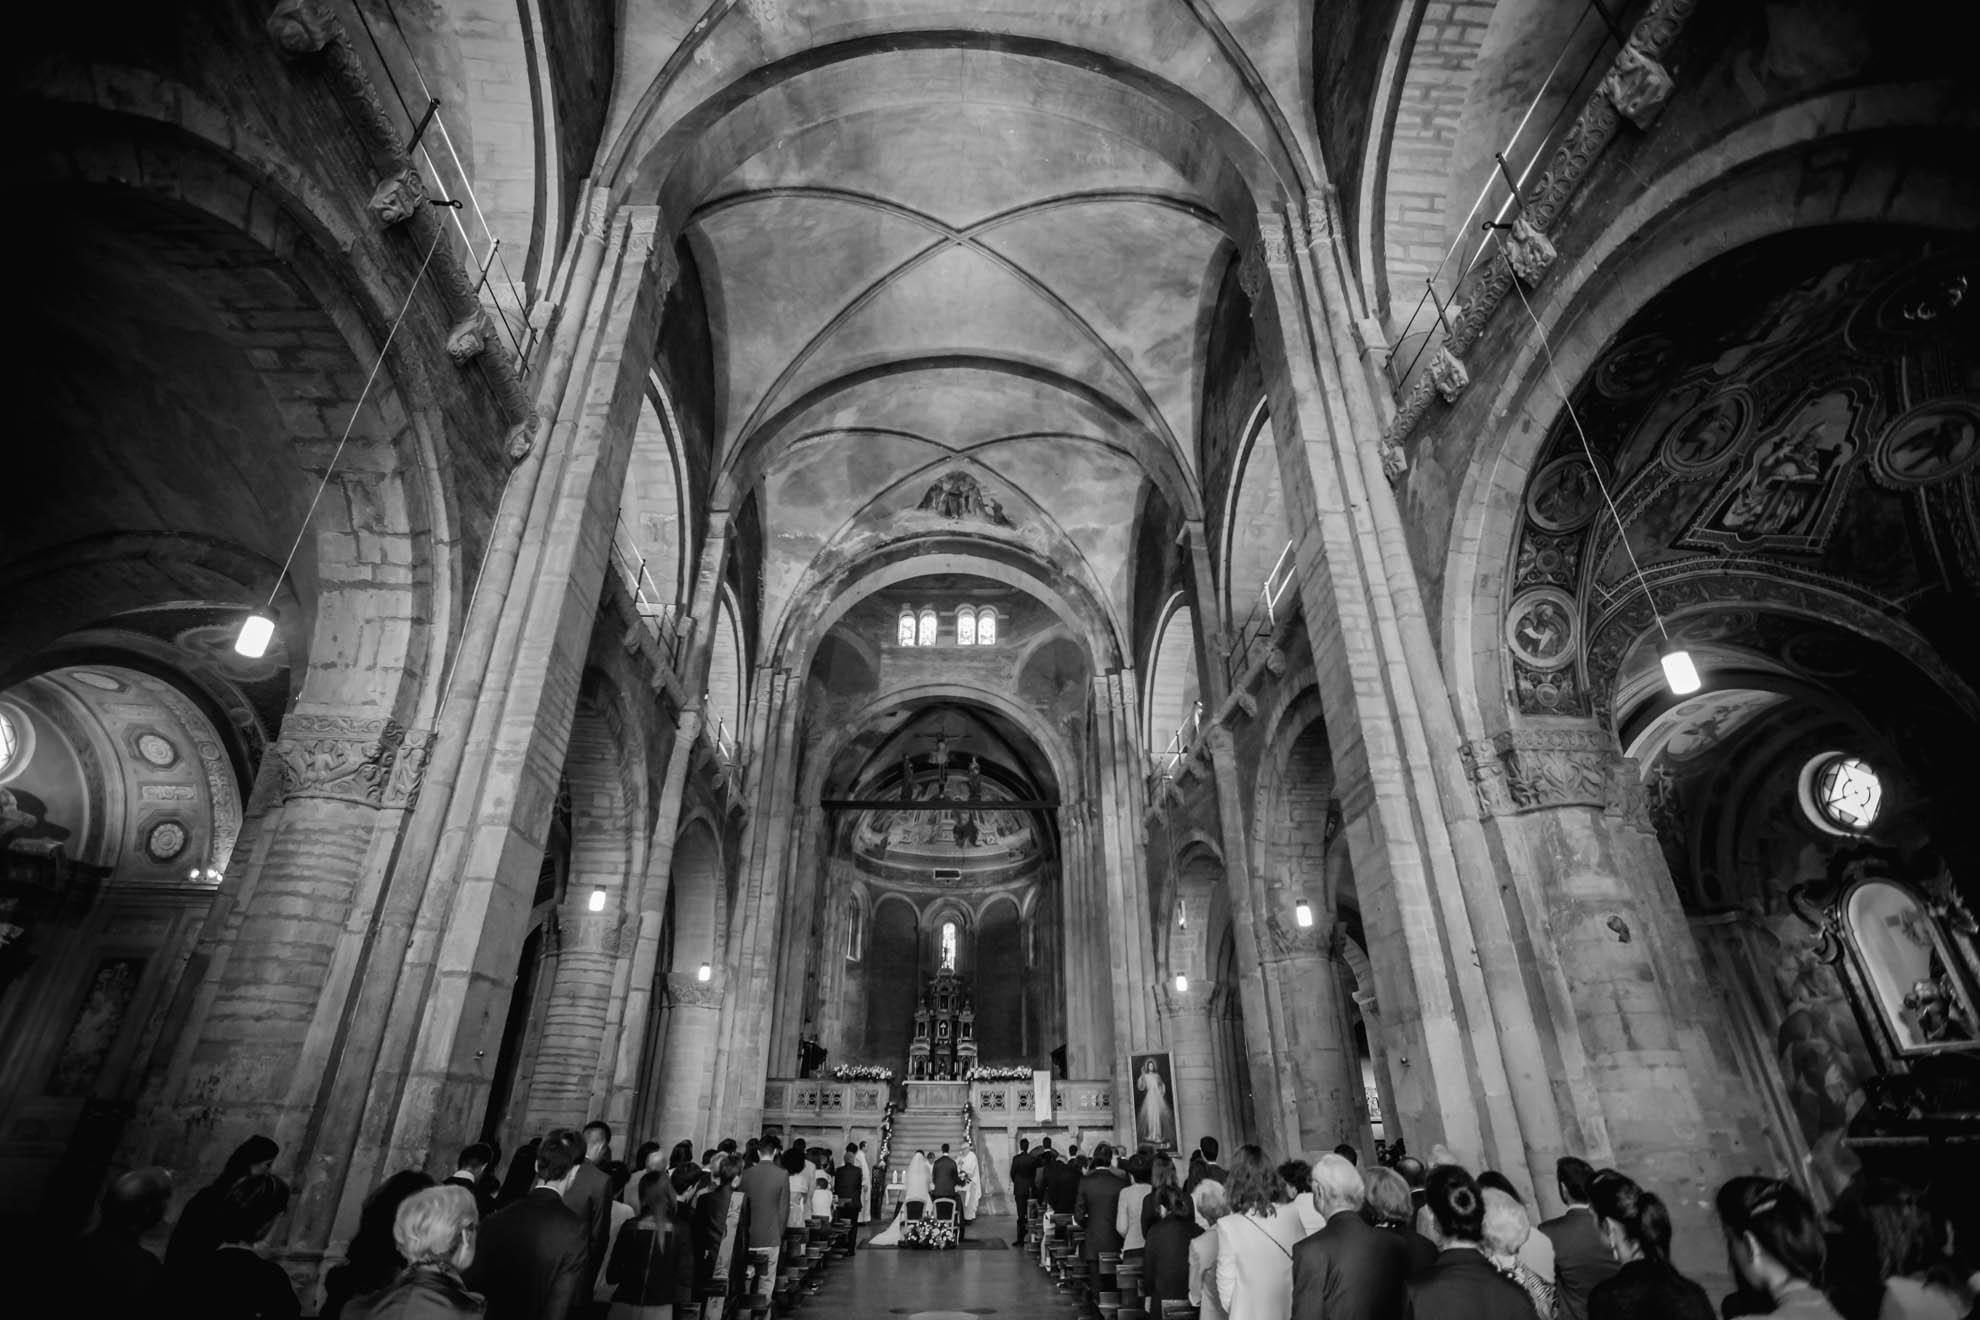 003 Fotografo per Matrimonio Diego Ravenna PaviaIMG_8959